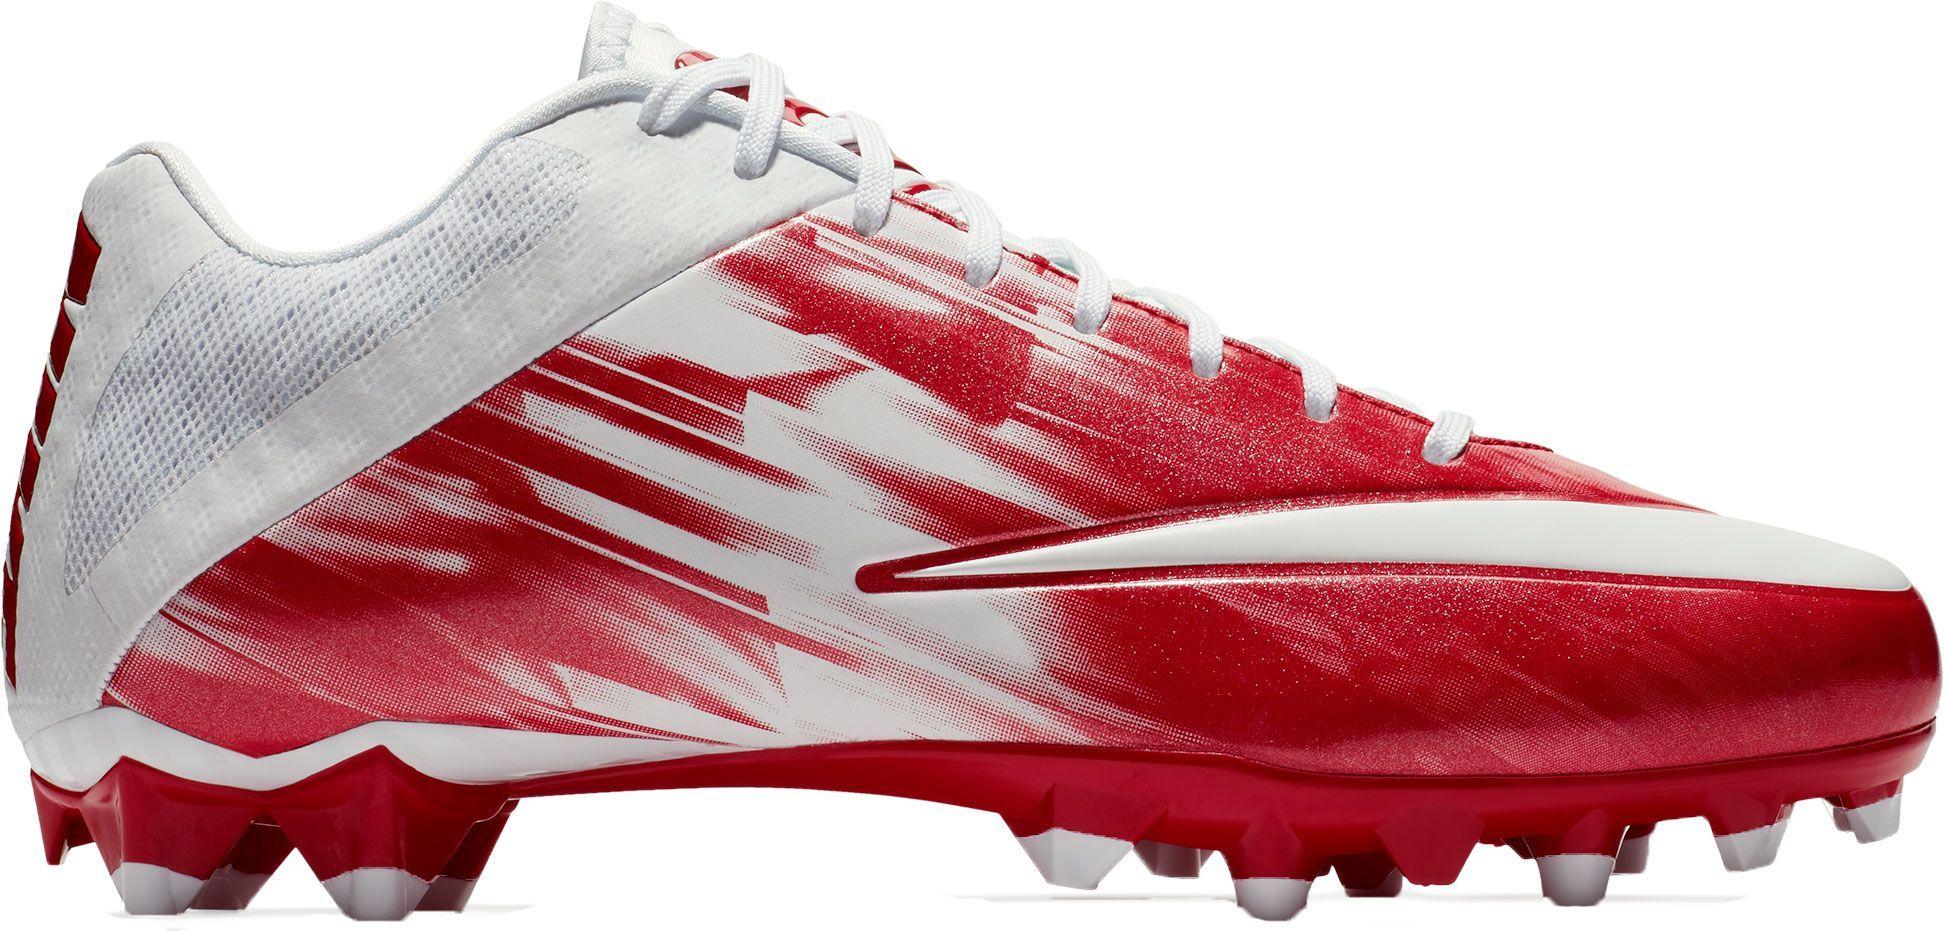 quality design b9f8d eb093 Nike Men s Vapor Speed 2 Lacrosse Cleats, Size  10.5, White